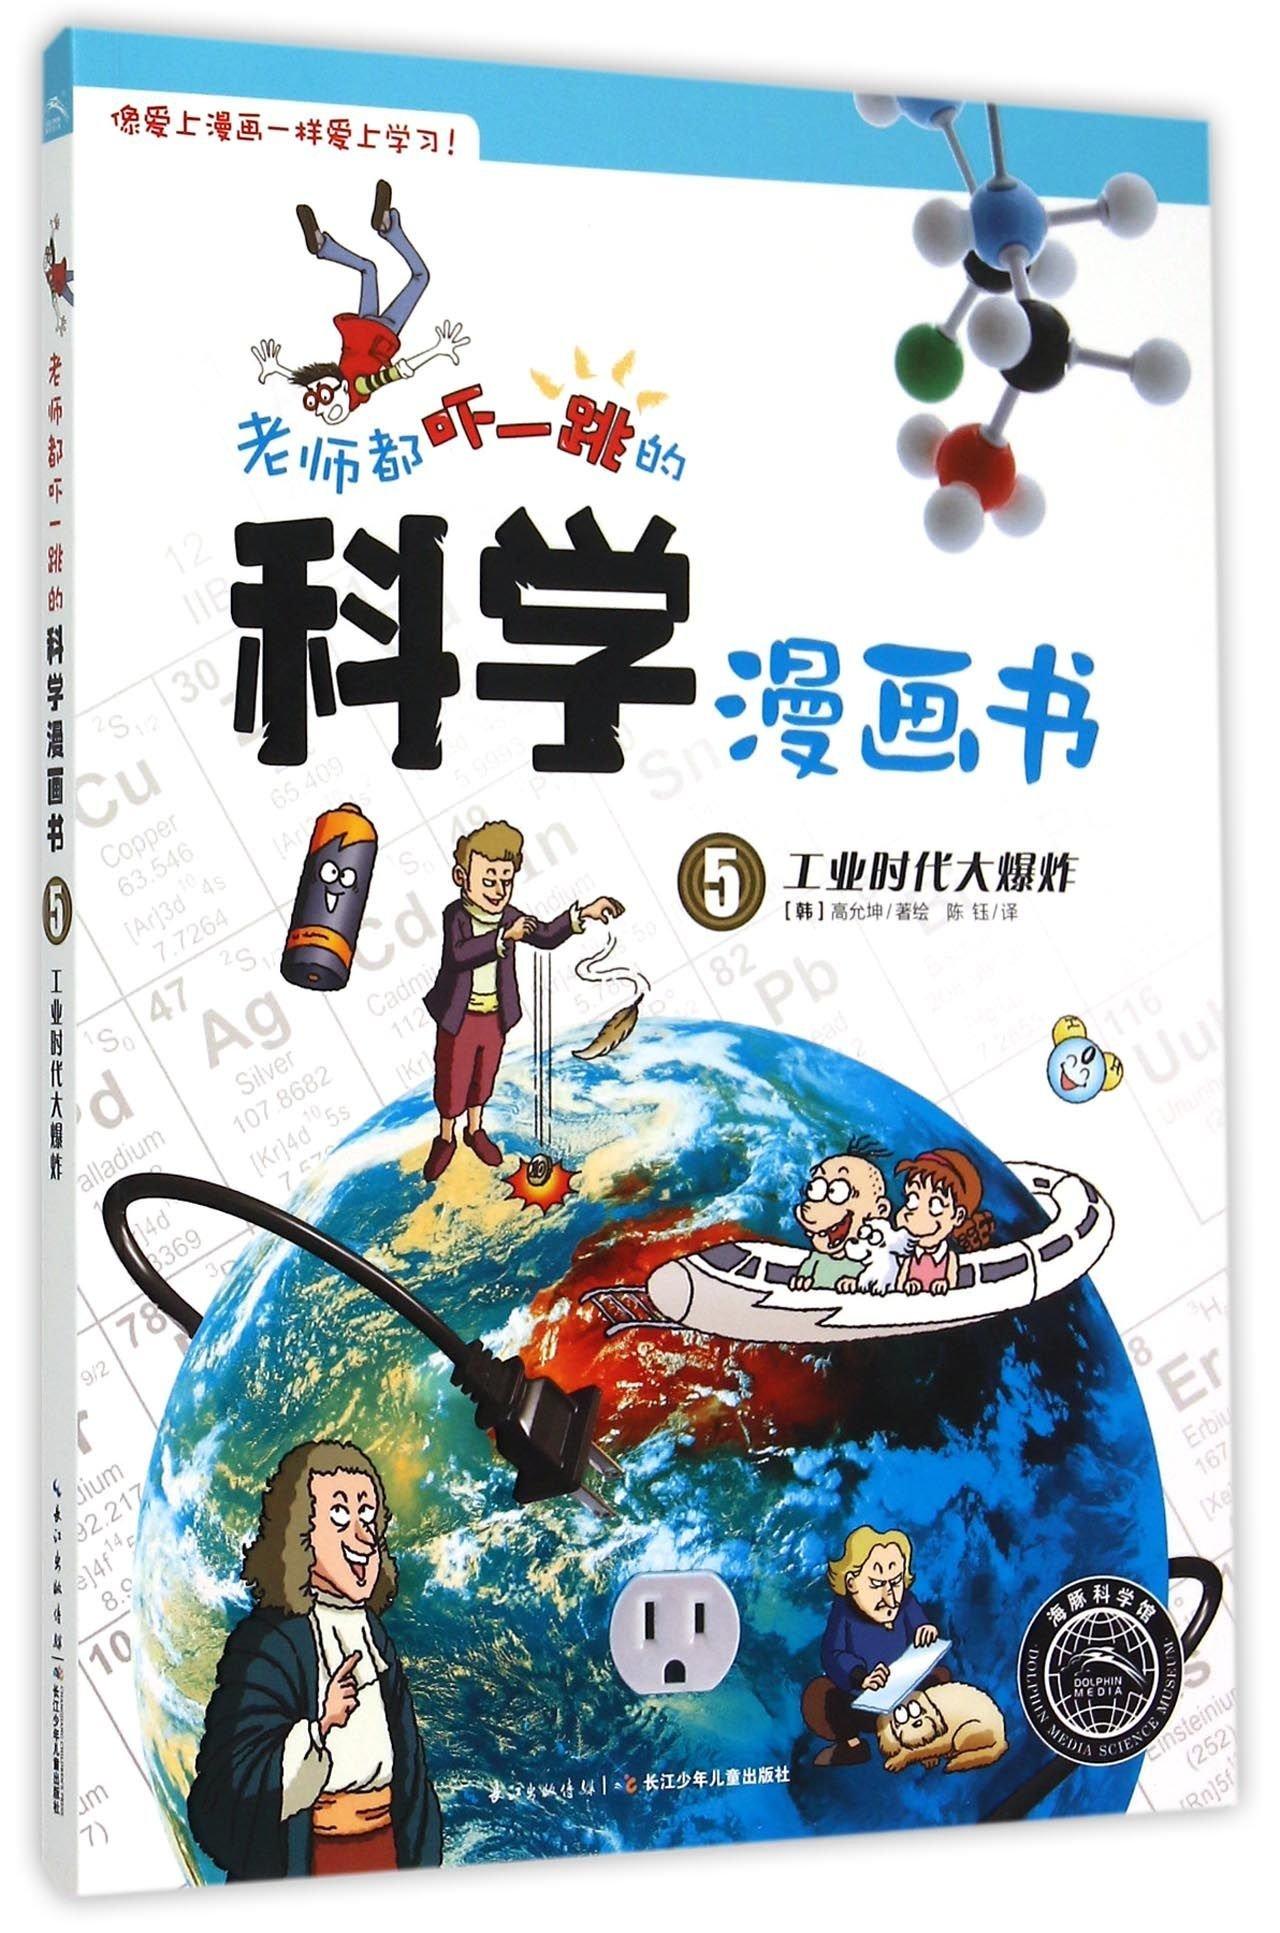 Download 老师都吓一跳的科学漫画书(5工业时代大爆炸) PDF